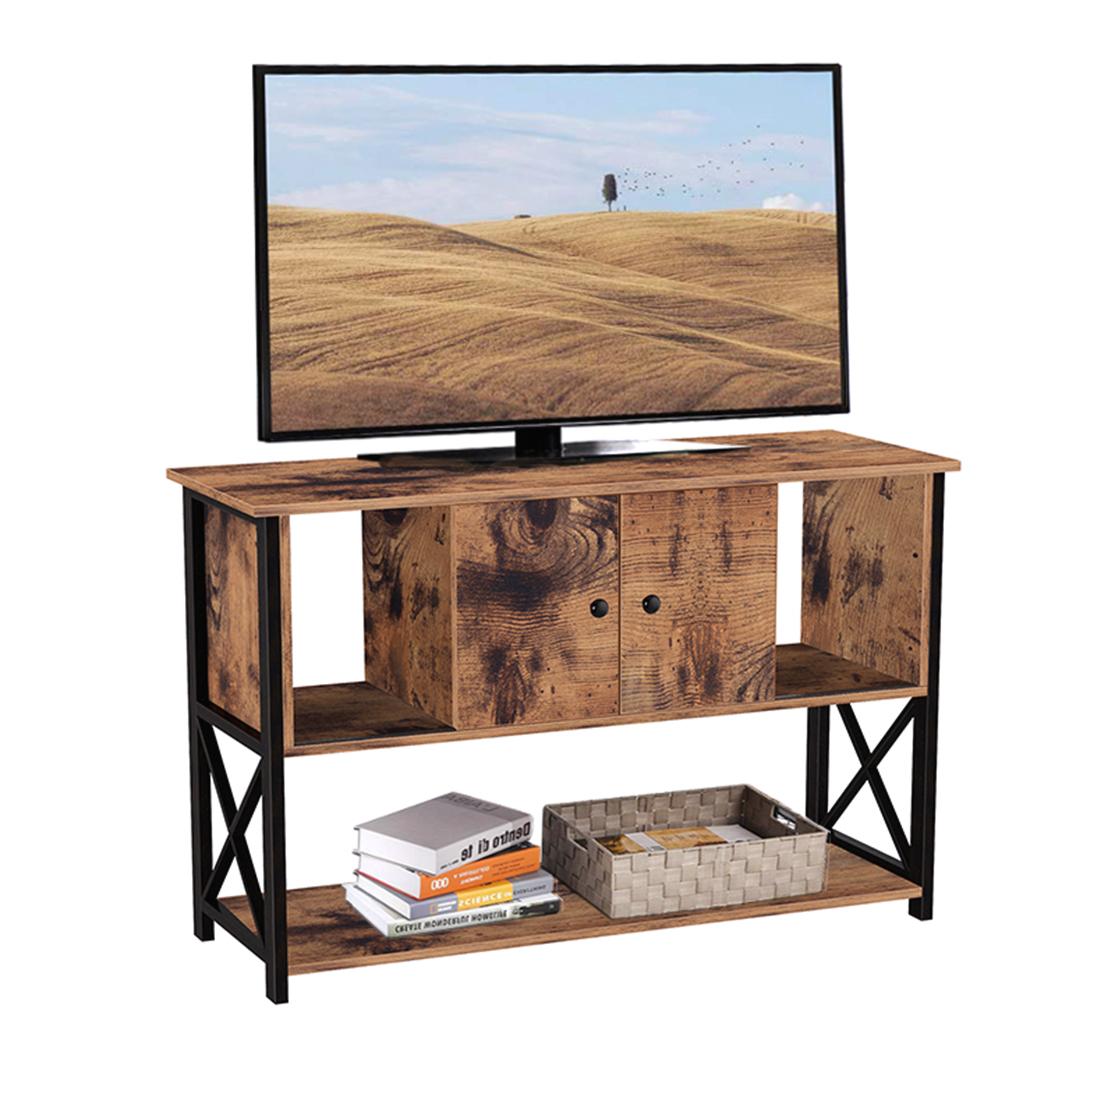 Fine Furniture Manufacturers Corner Tv Tables For Flat Screens Bedroom Tv Unit Buy Living Room Tv Cabinet Bedroom Tv Unit Corner Tv Tables For Flat Screens Product On Alibaba Com